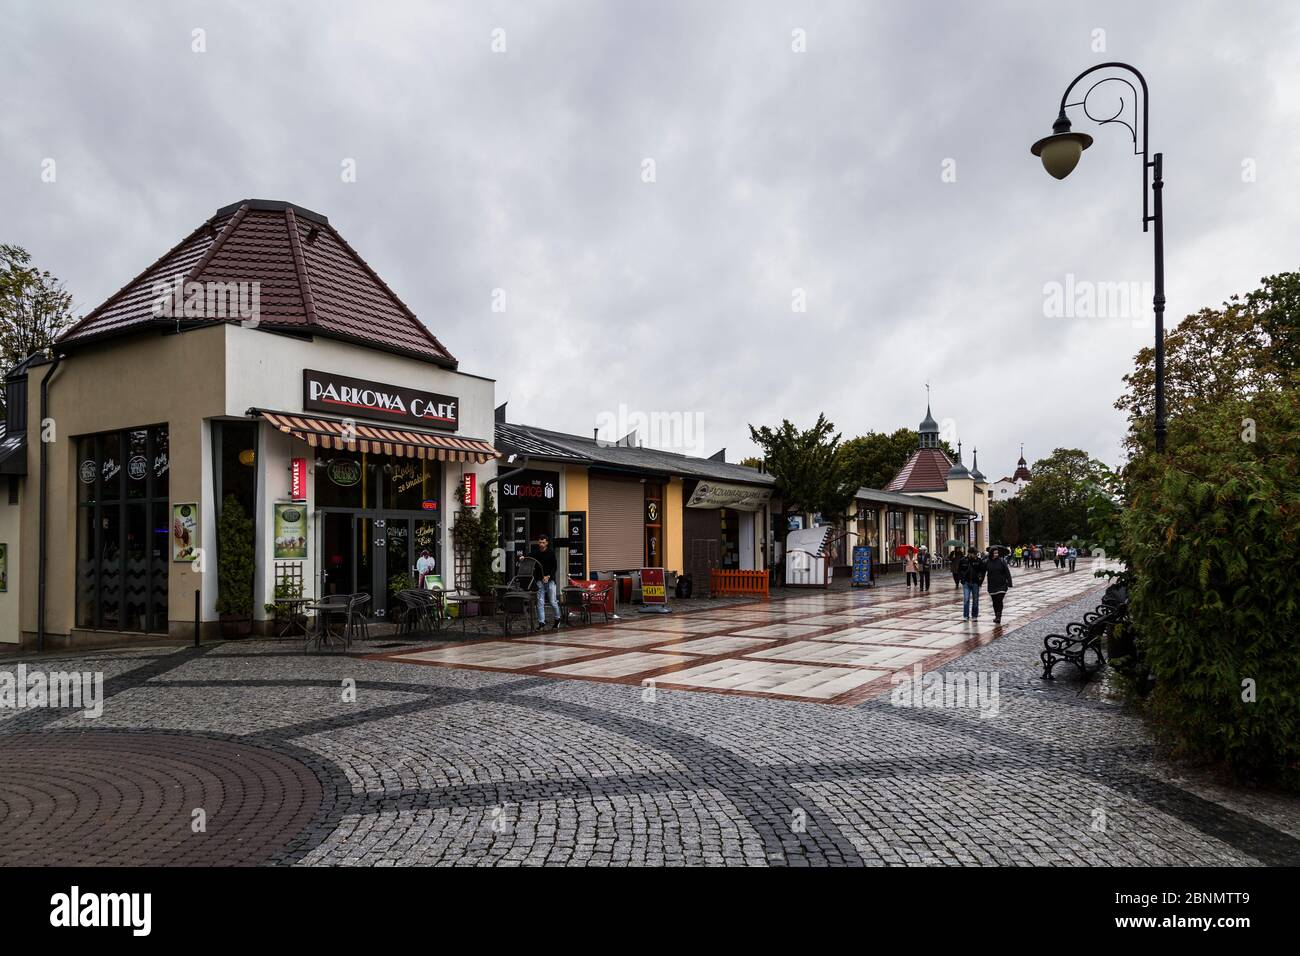 Europe, Poland, West Pomeranian Voivodeship, Swinoujscie / Swinemünde Stock Photo